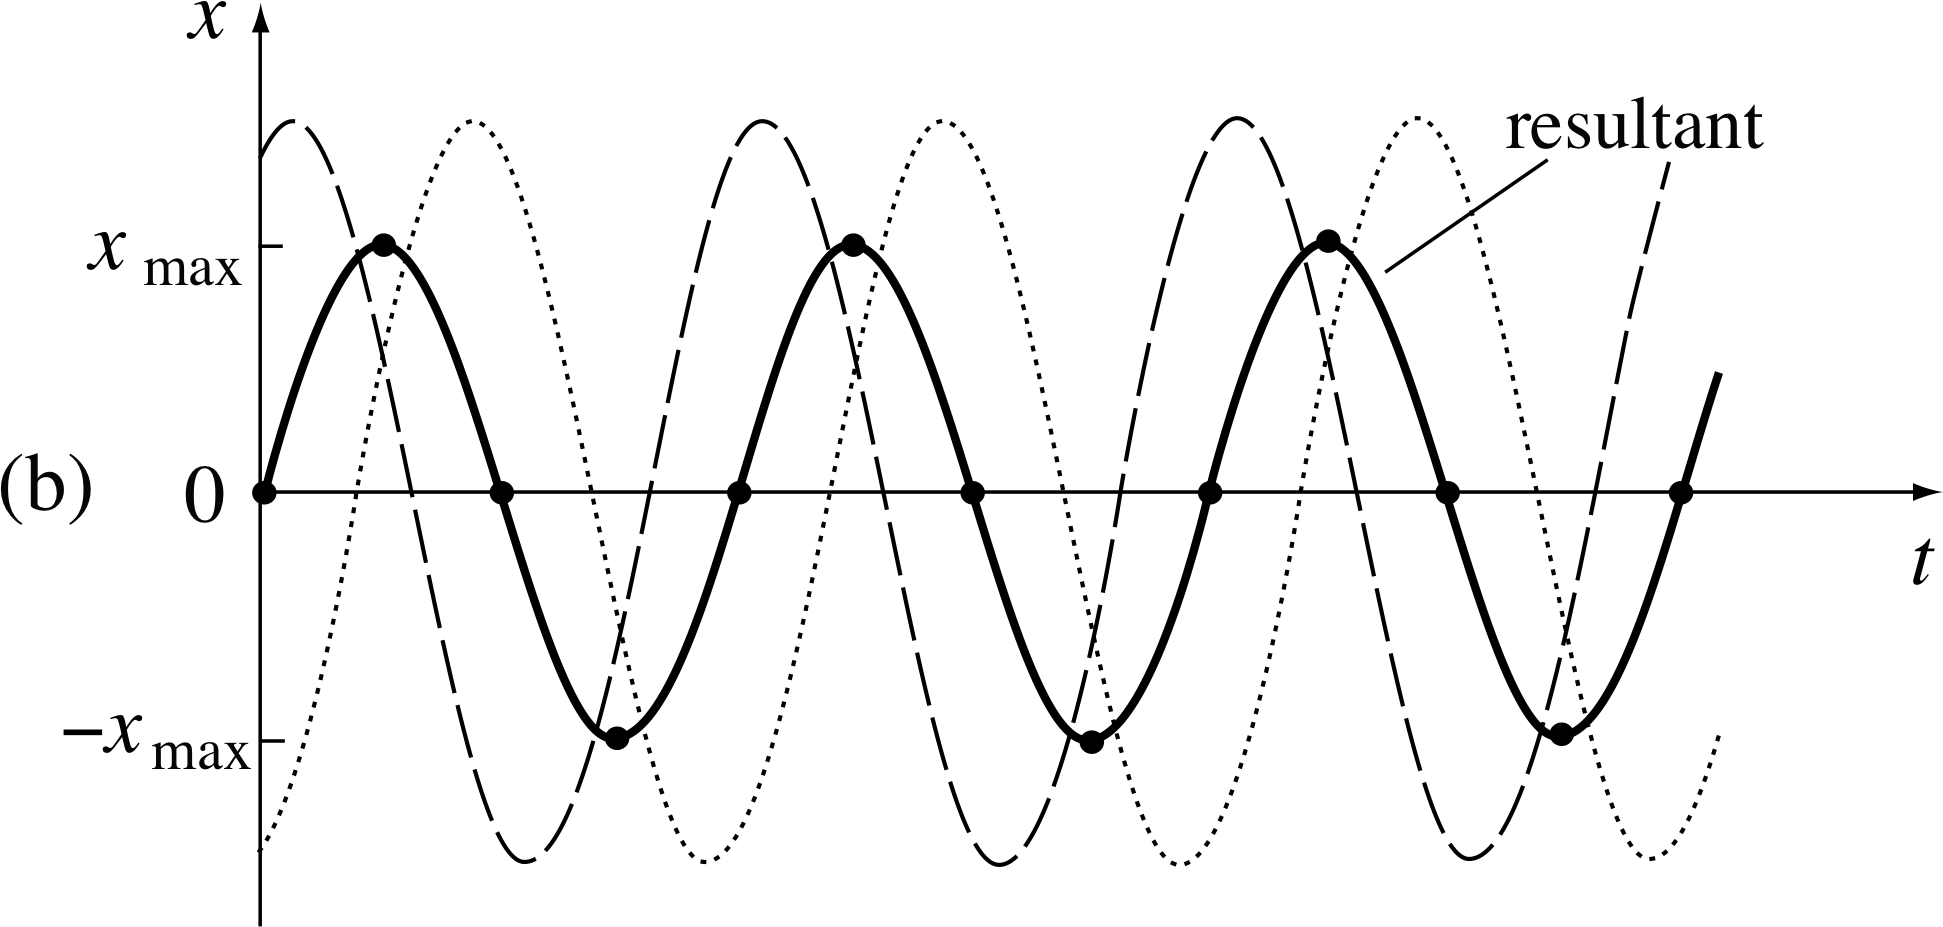 Pplato Flap Phys 51 Simple Harmonic Motion Repeat Timer Circuit Diagram Electronic Circuits Pinterest Figure